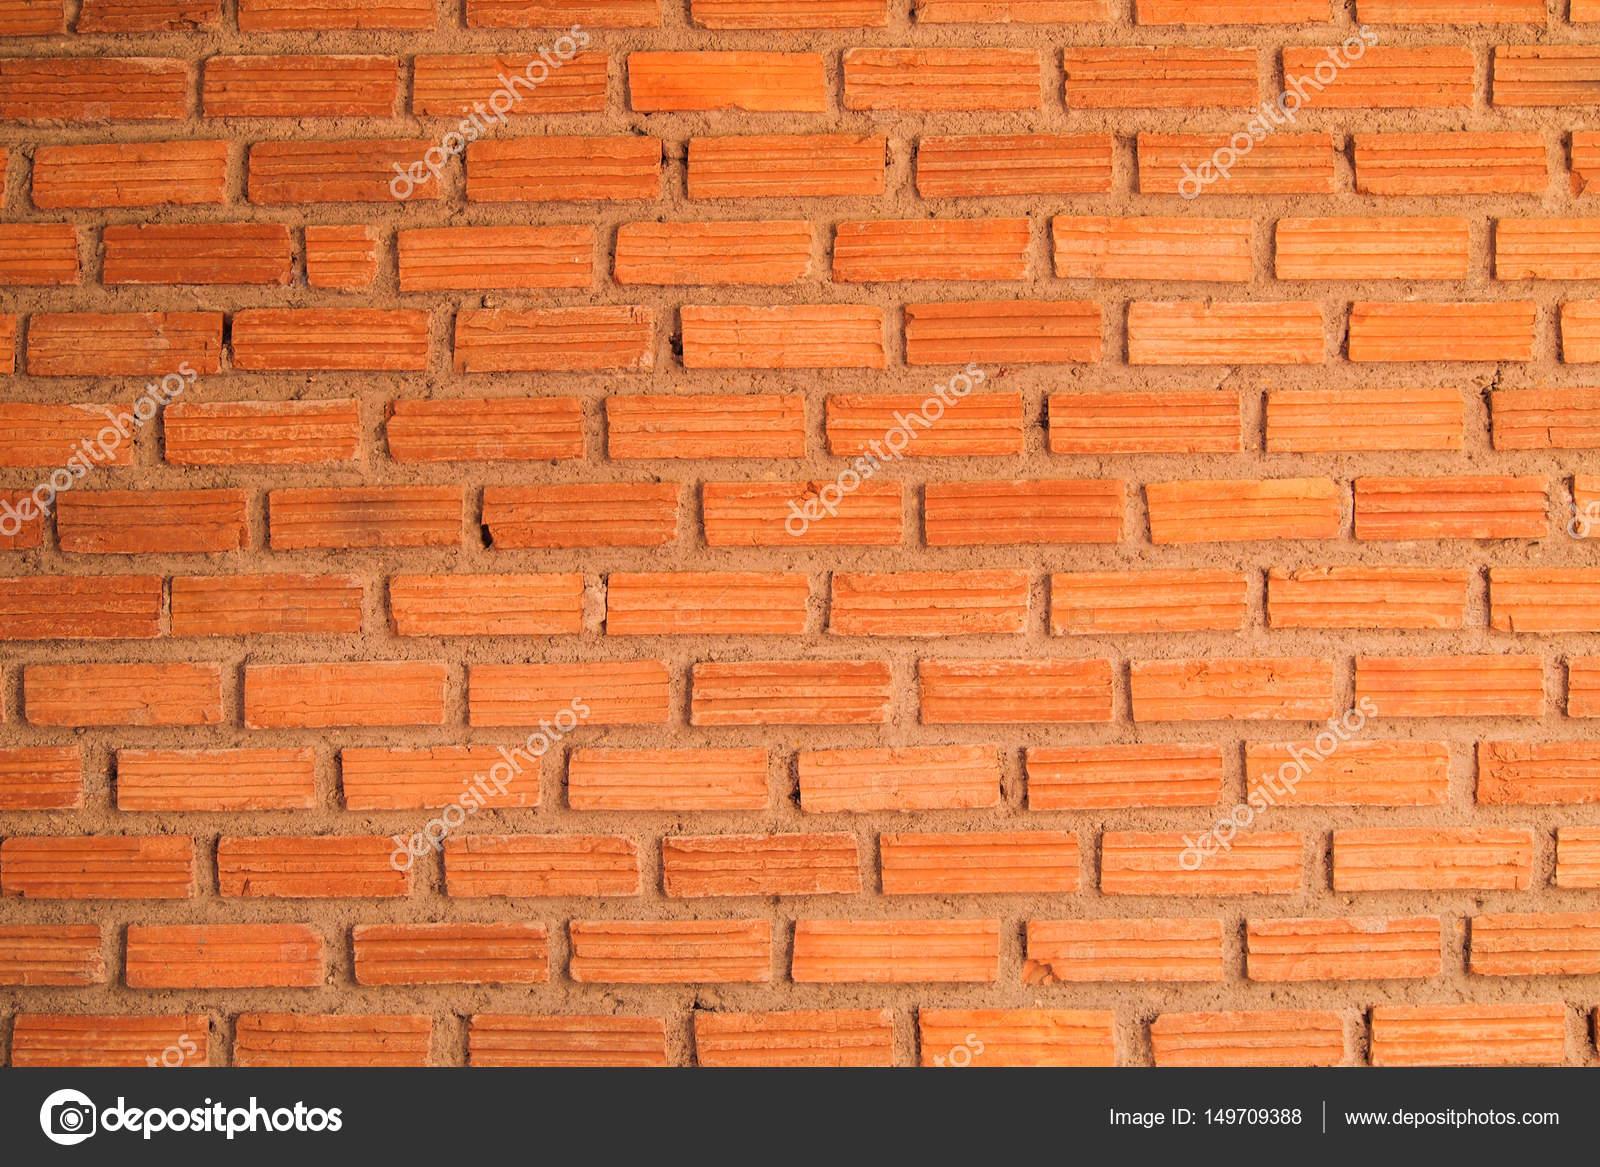 Beautiful Orange Brick Wallpaper Background Photo By Worrathanawat